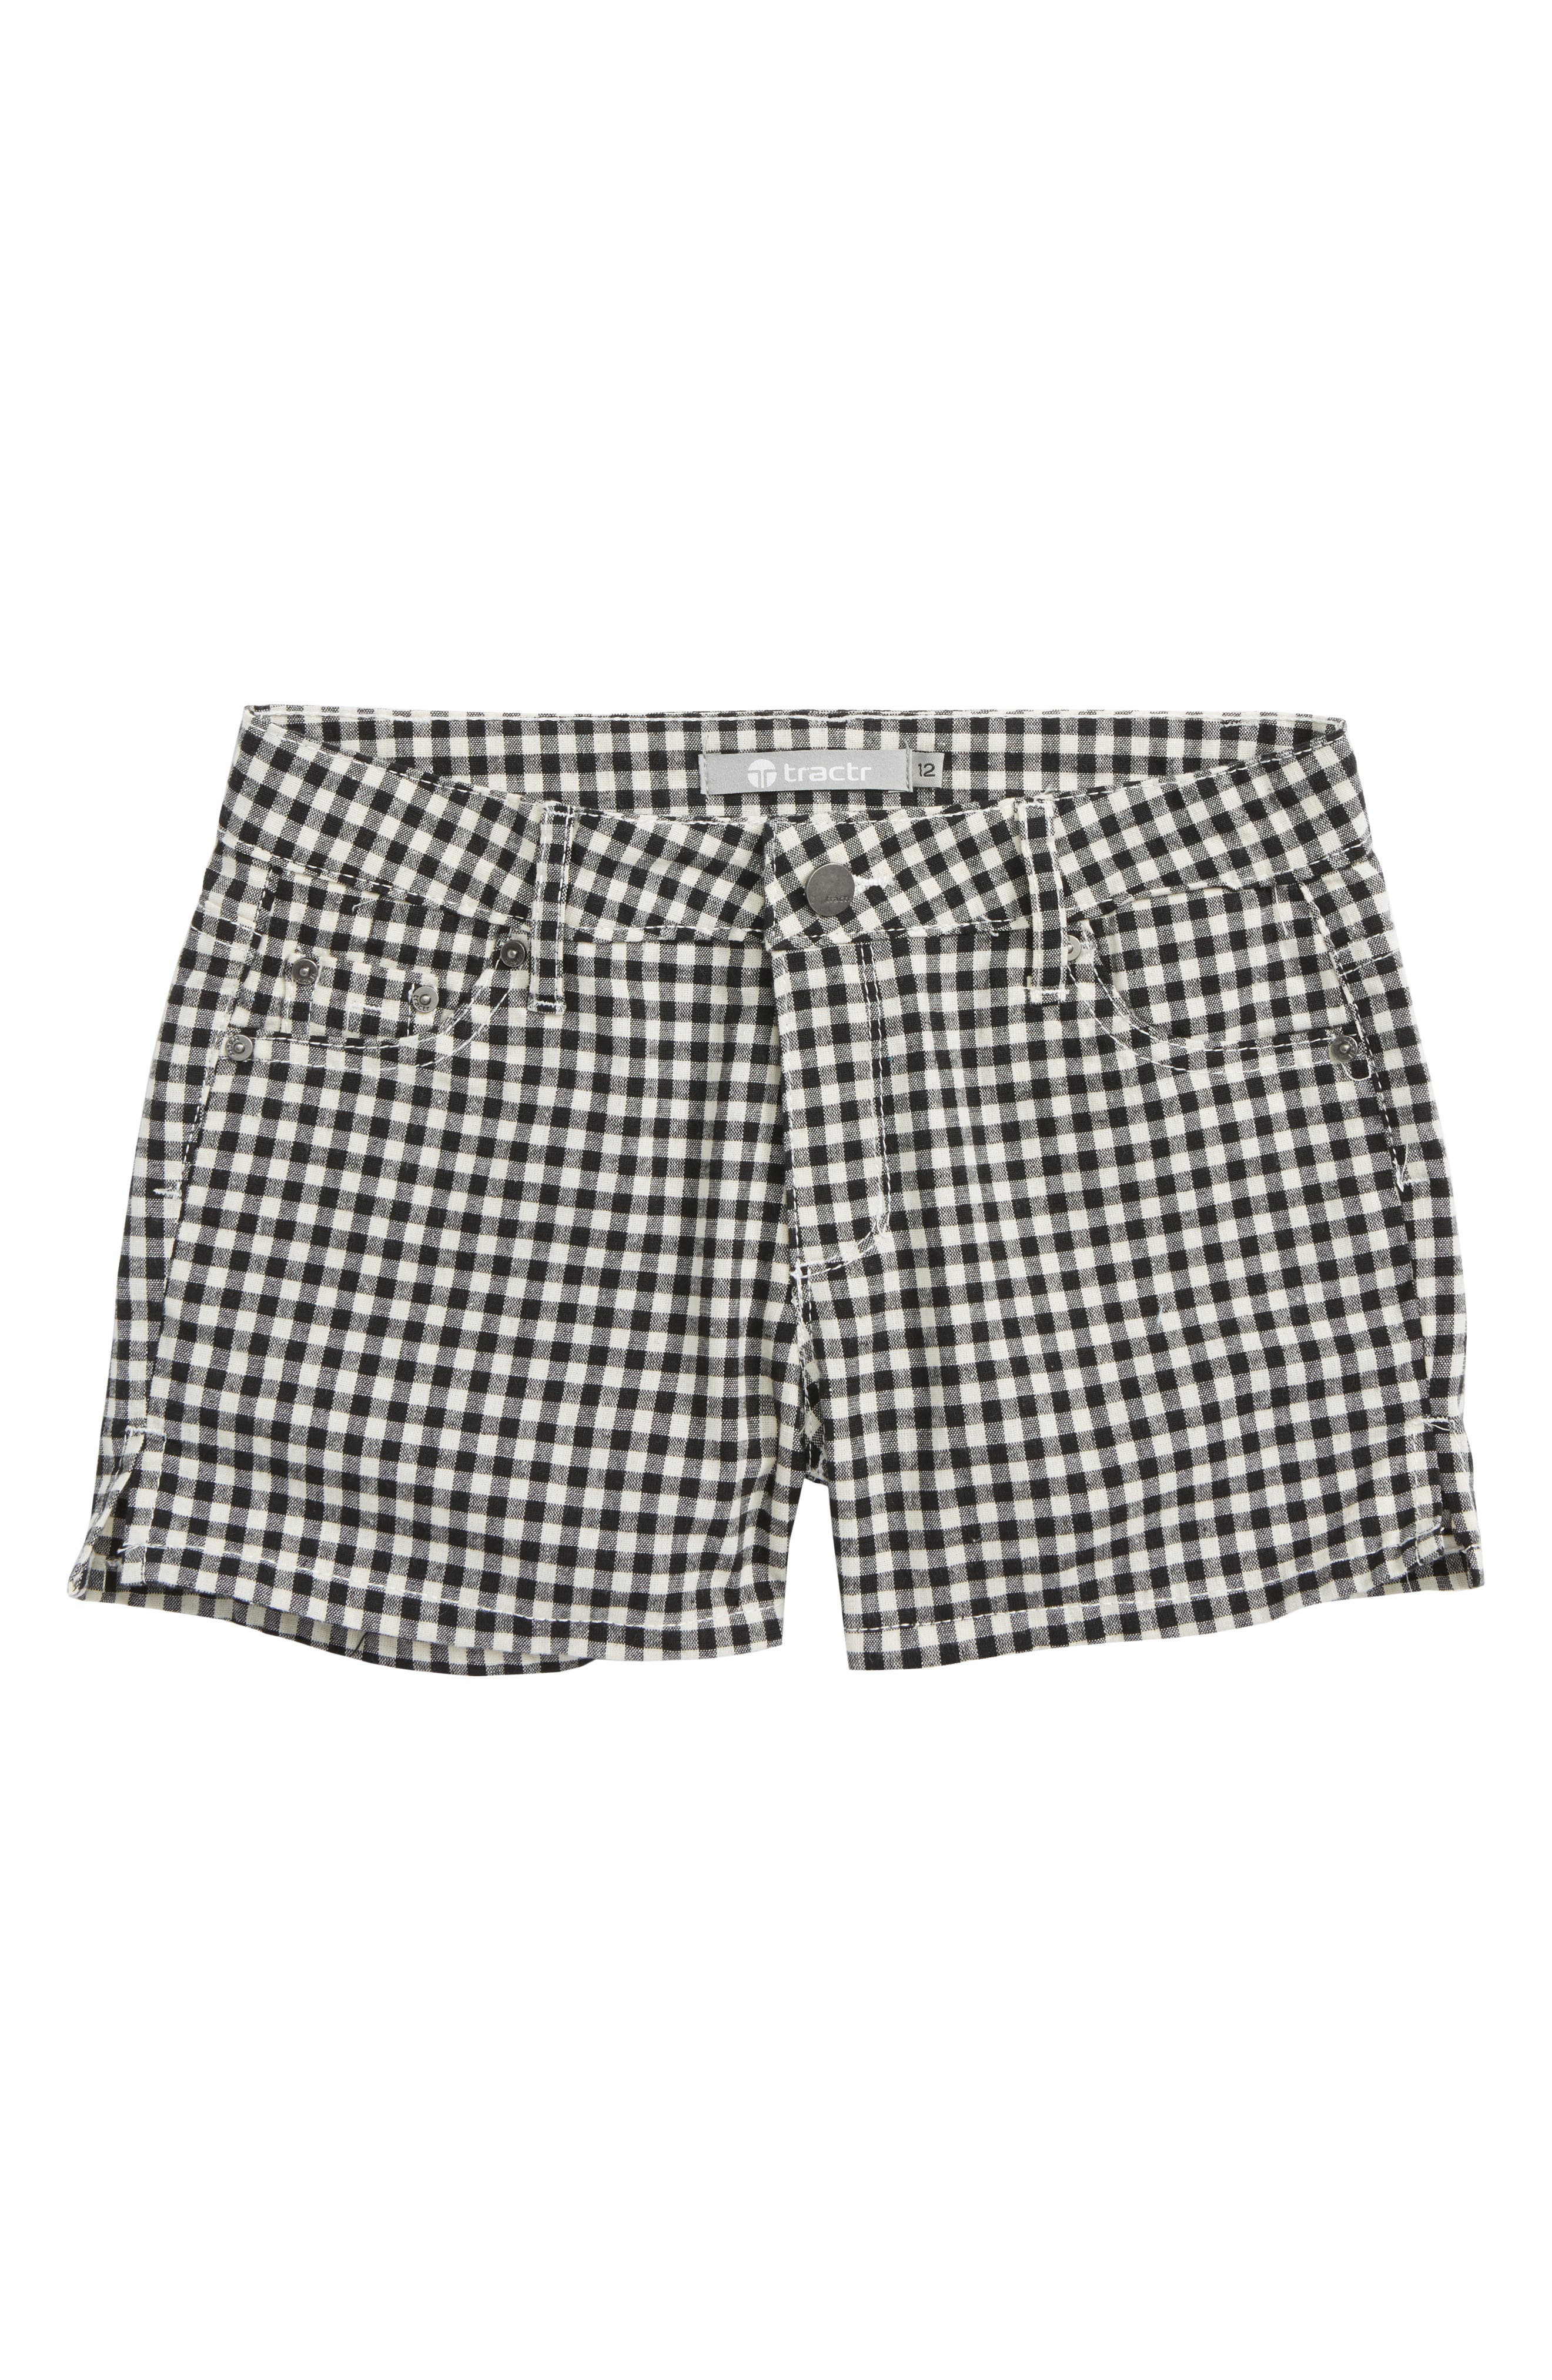 Gingham Shorts,                         Main,                         color, Black/ White